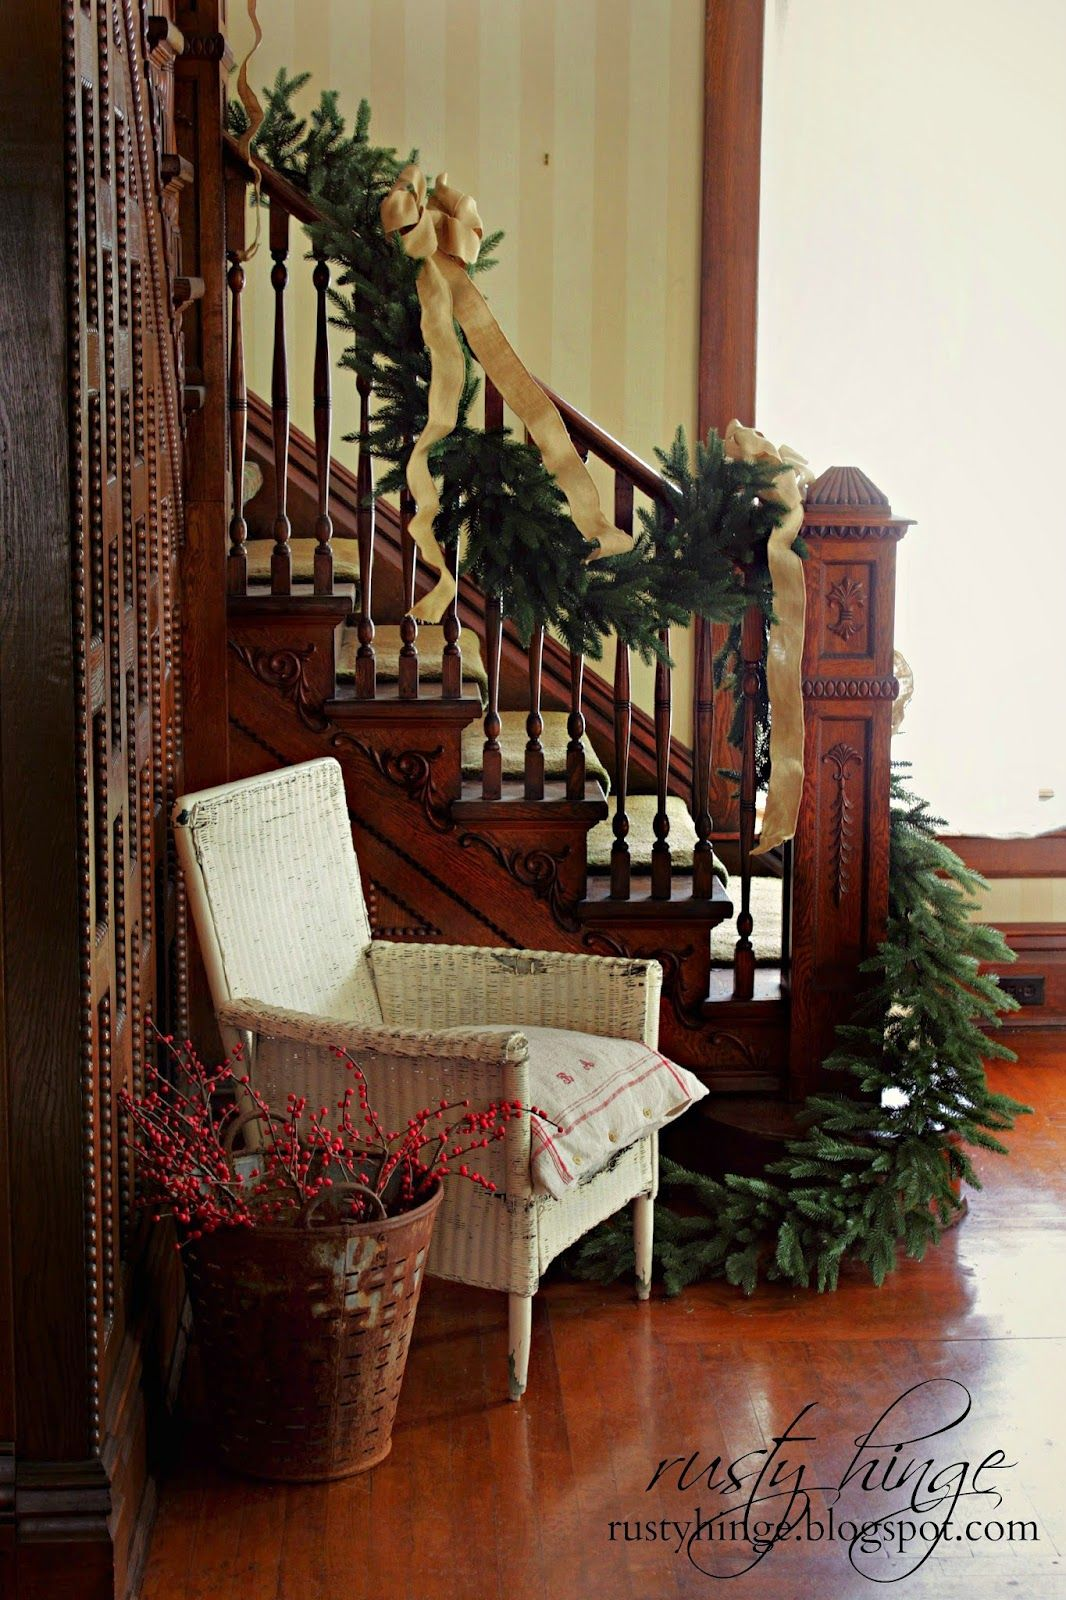 d coration de no l dans l 39 escalier christmas deco noel christmas pinterest recetas. Black Bedroom Furniture Sets. Home Design Ideas